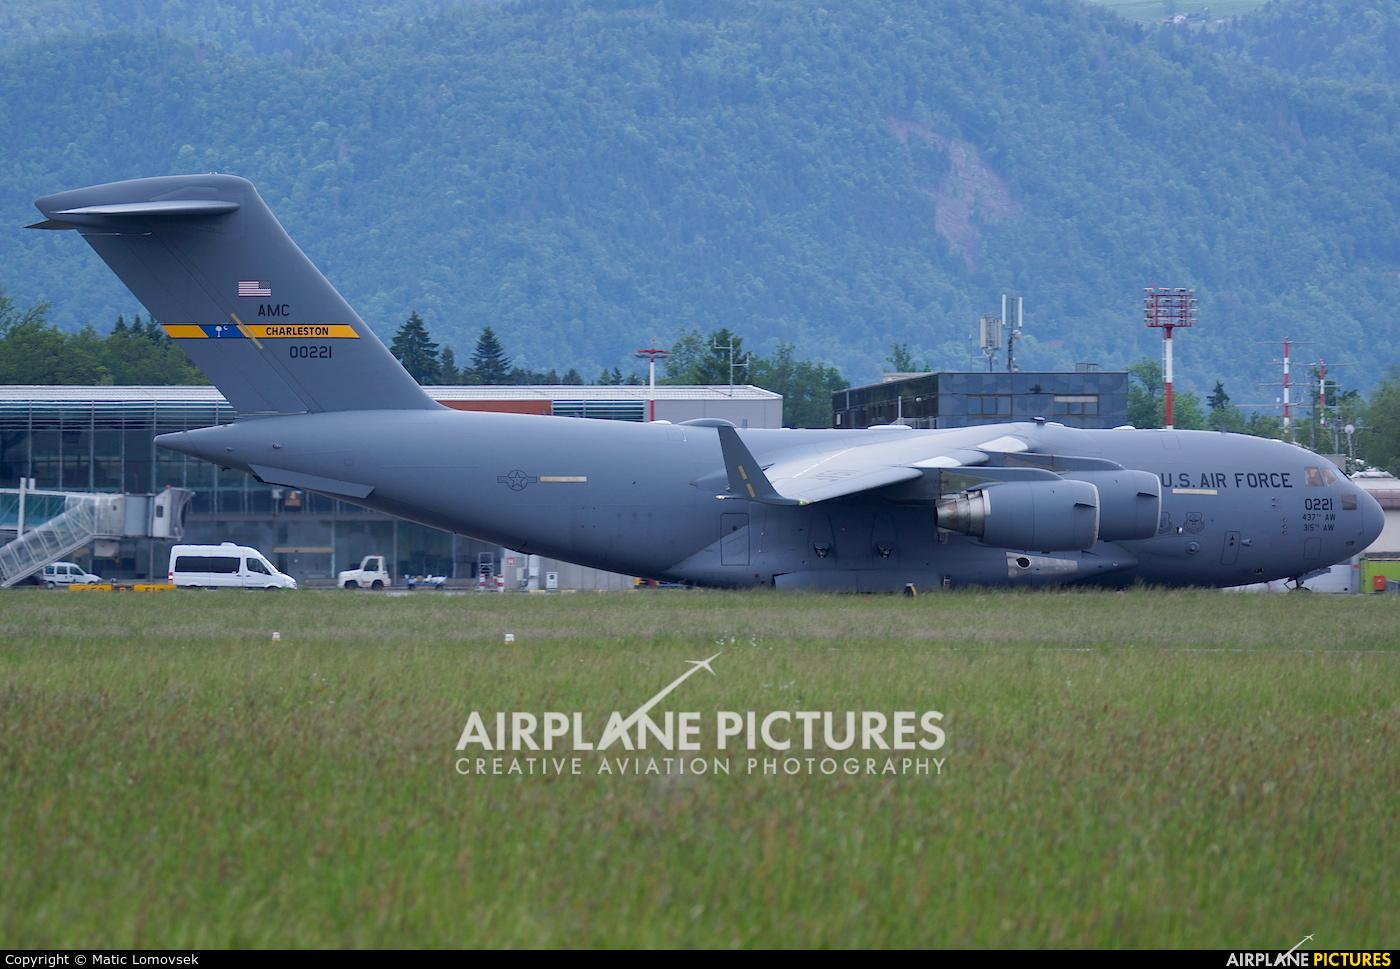 USA - Air Force 10-0221 aircraft at Ljubljana - Brnik